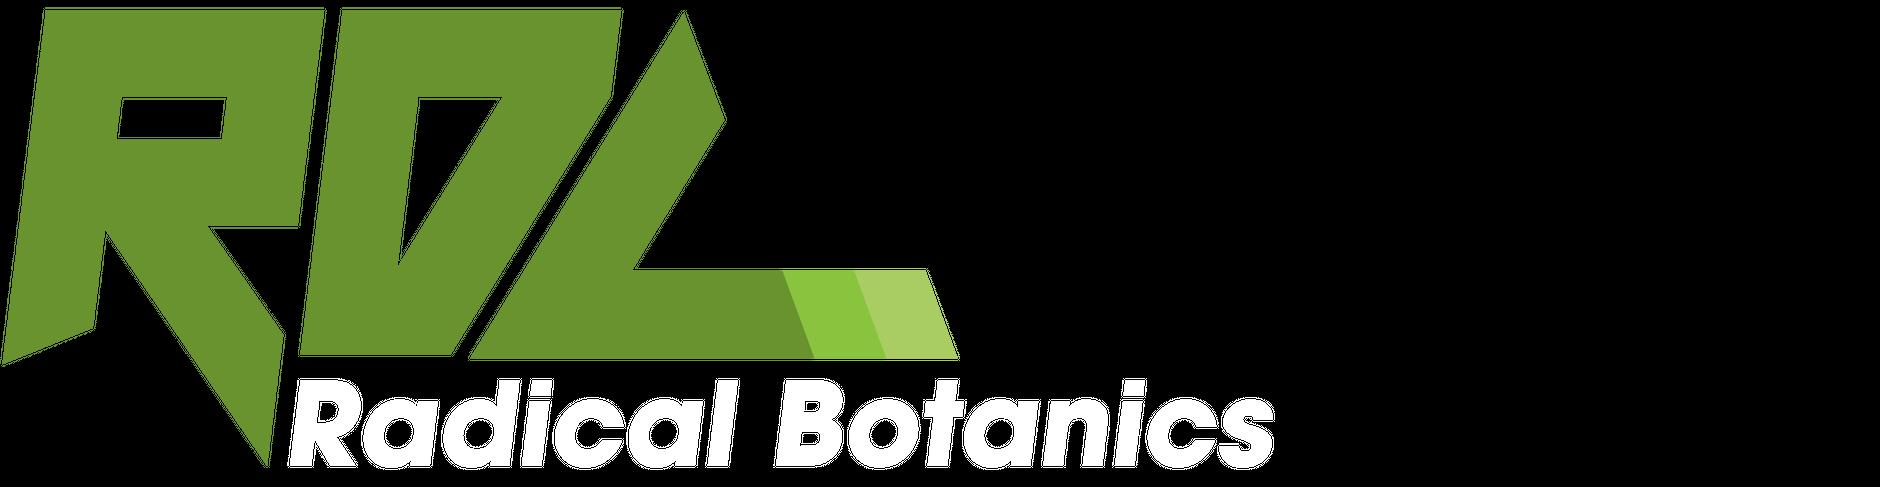 radical botanics